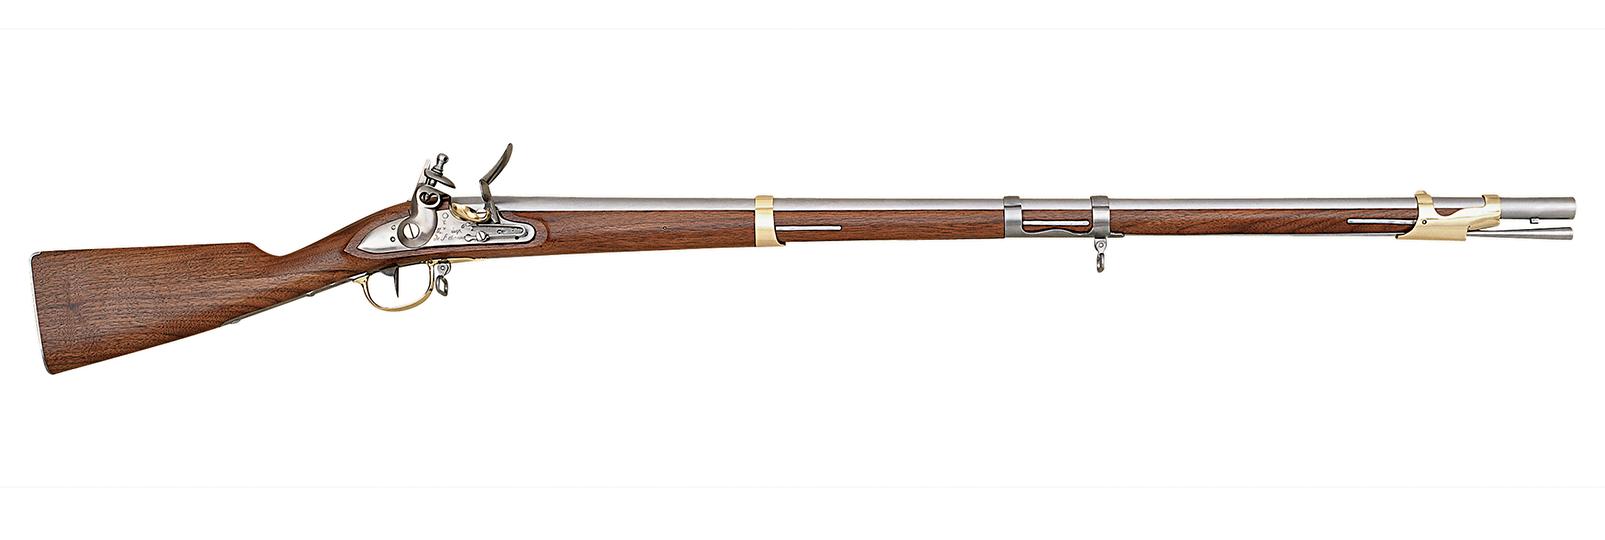 """An IX"" Dragoons Rifle"